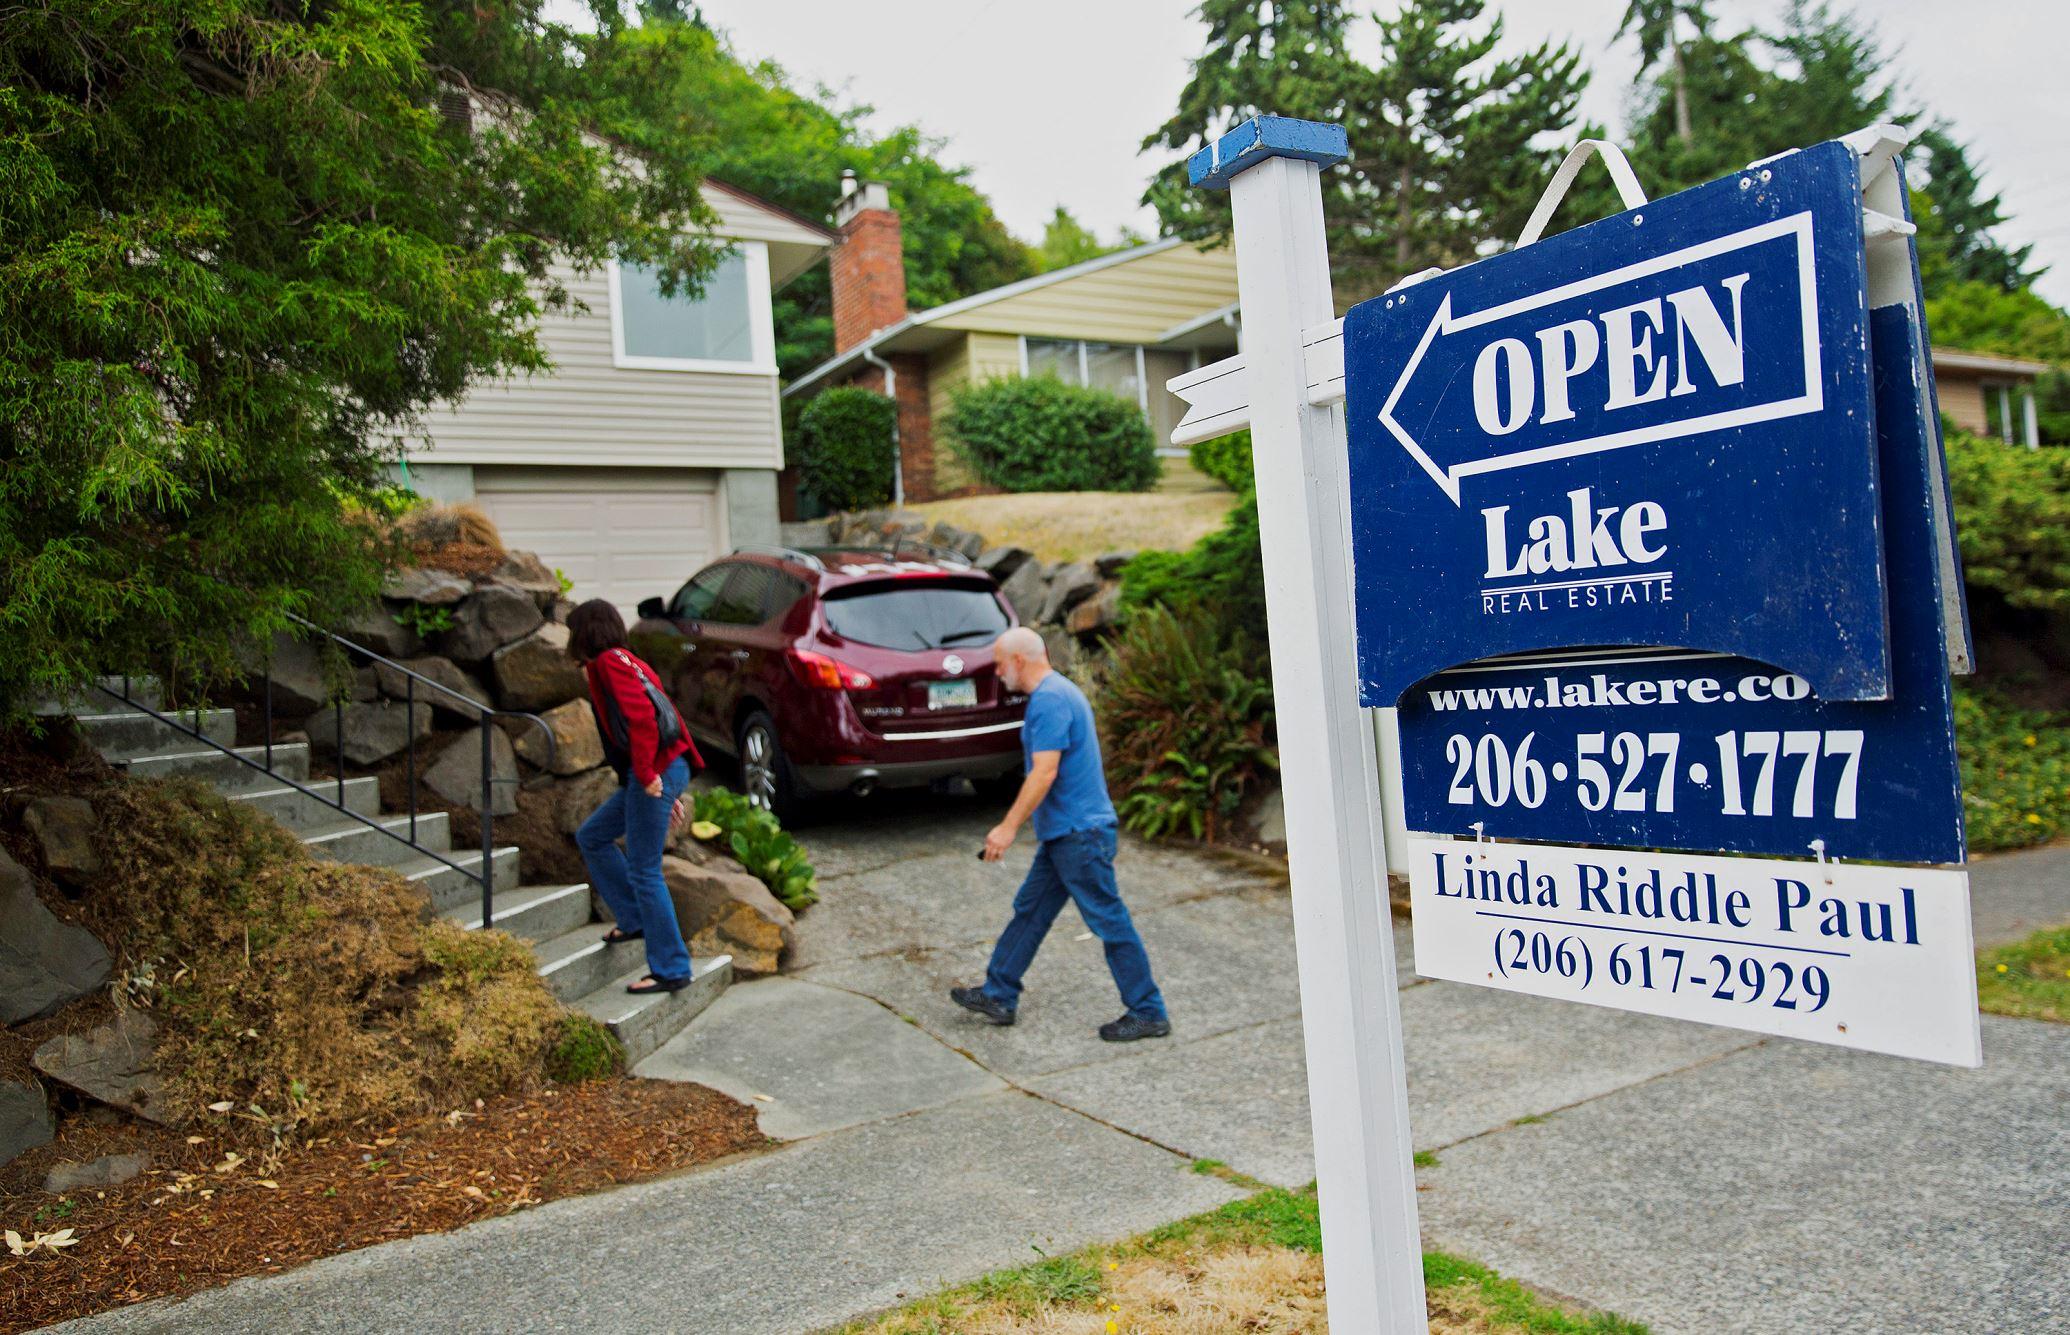 Millennials' New Weapon in Bidding Wars: A Parent's Home Equity